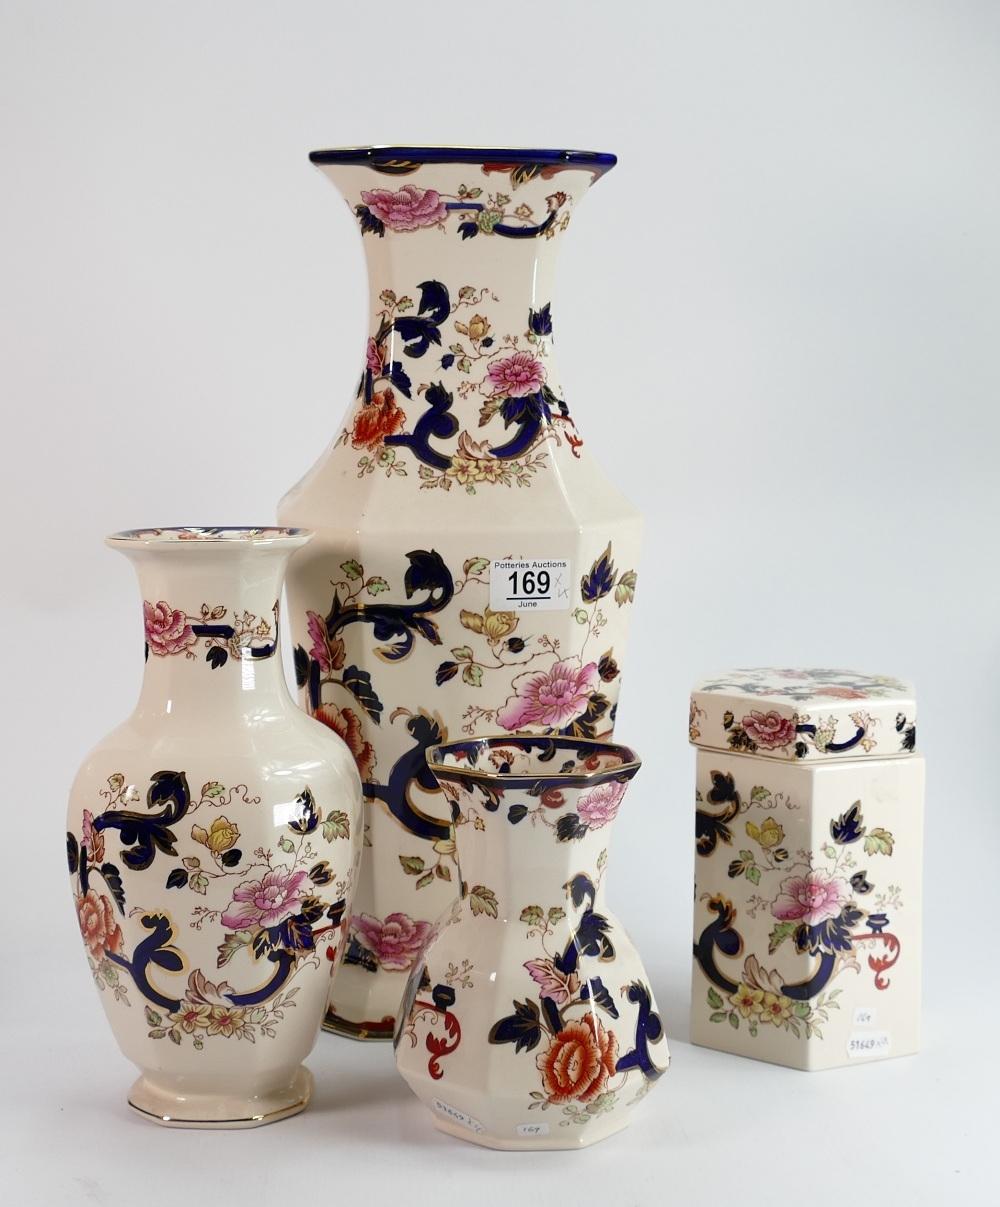 Very Large Masons Mandalay vase and 3 others: Vases measure 42.5 cm, 26cm & 16cm, large vase has 2 - Image 2 of 2